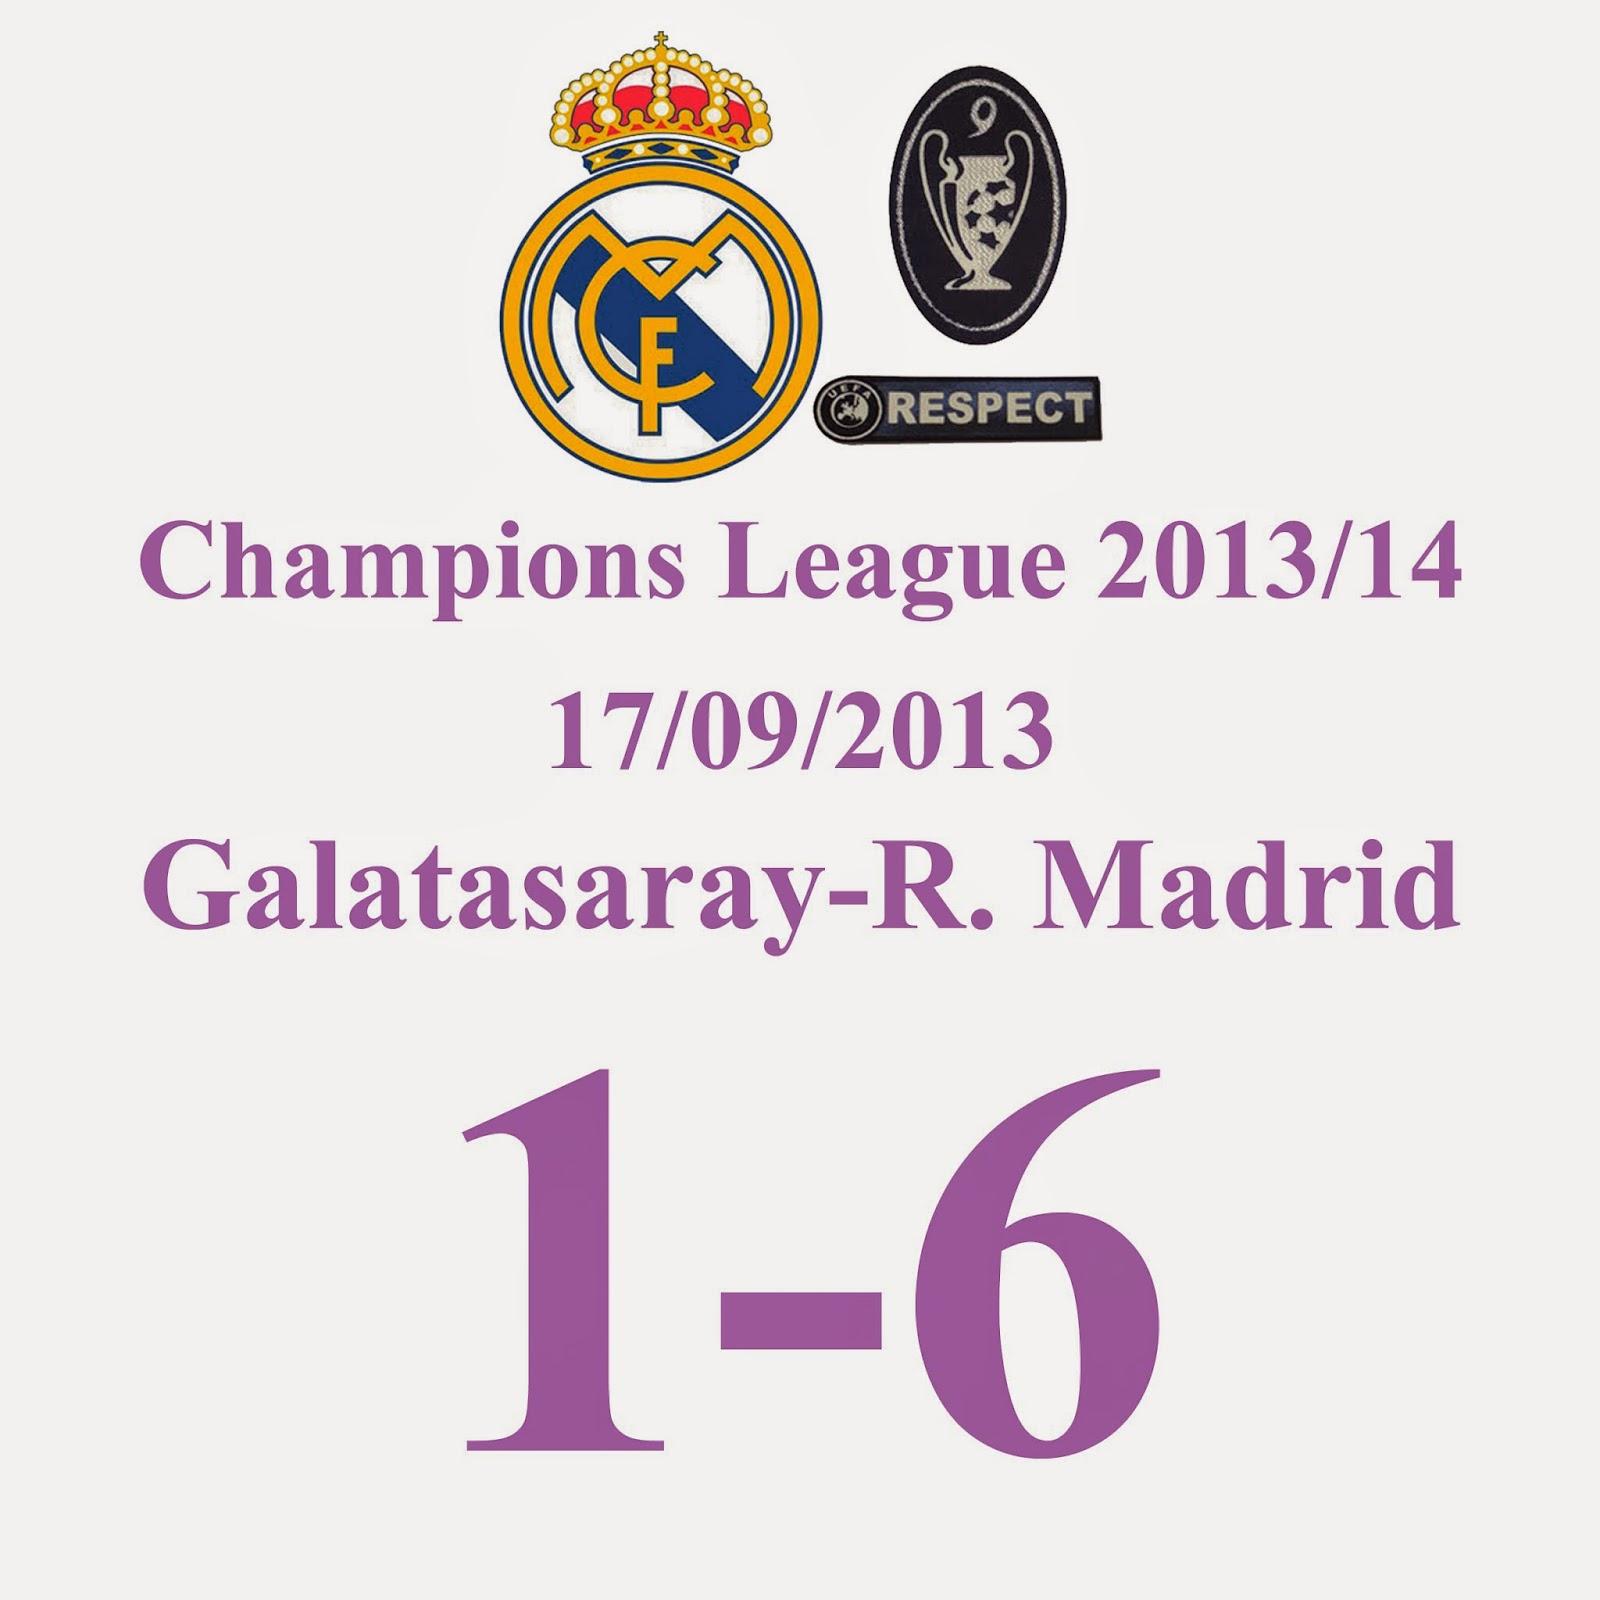 GALATASARAY 1 - REAL MADRID 6 (17/09/2013) - Champions League 13/14 (HAT TRICK DE C. RONALDO.)